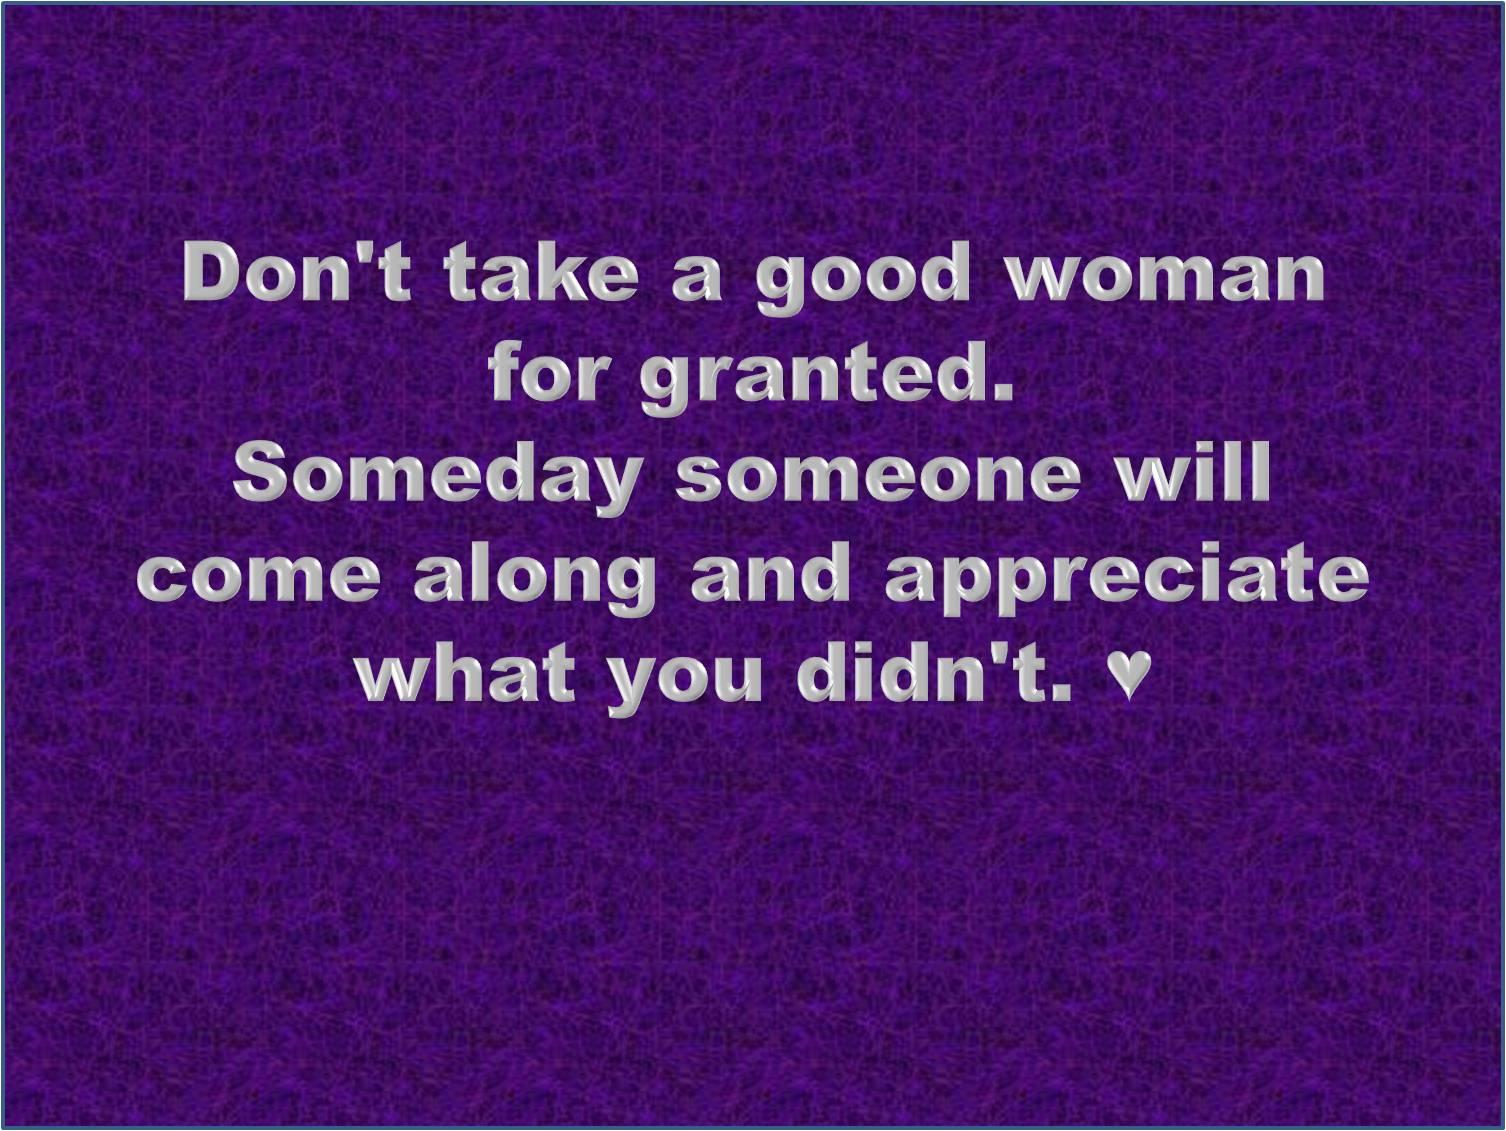 Coolest quote #4